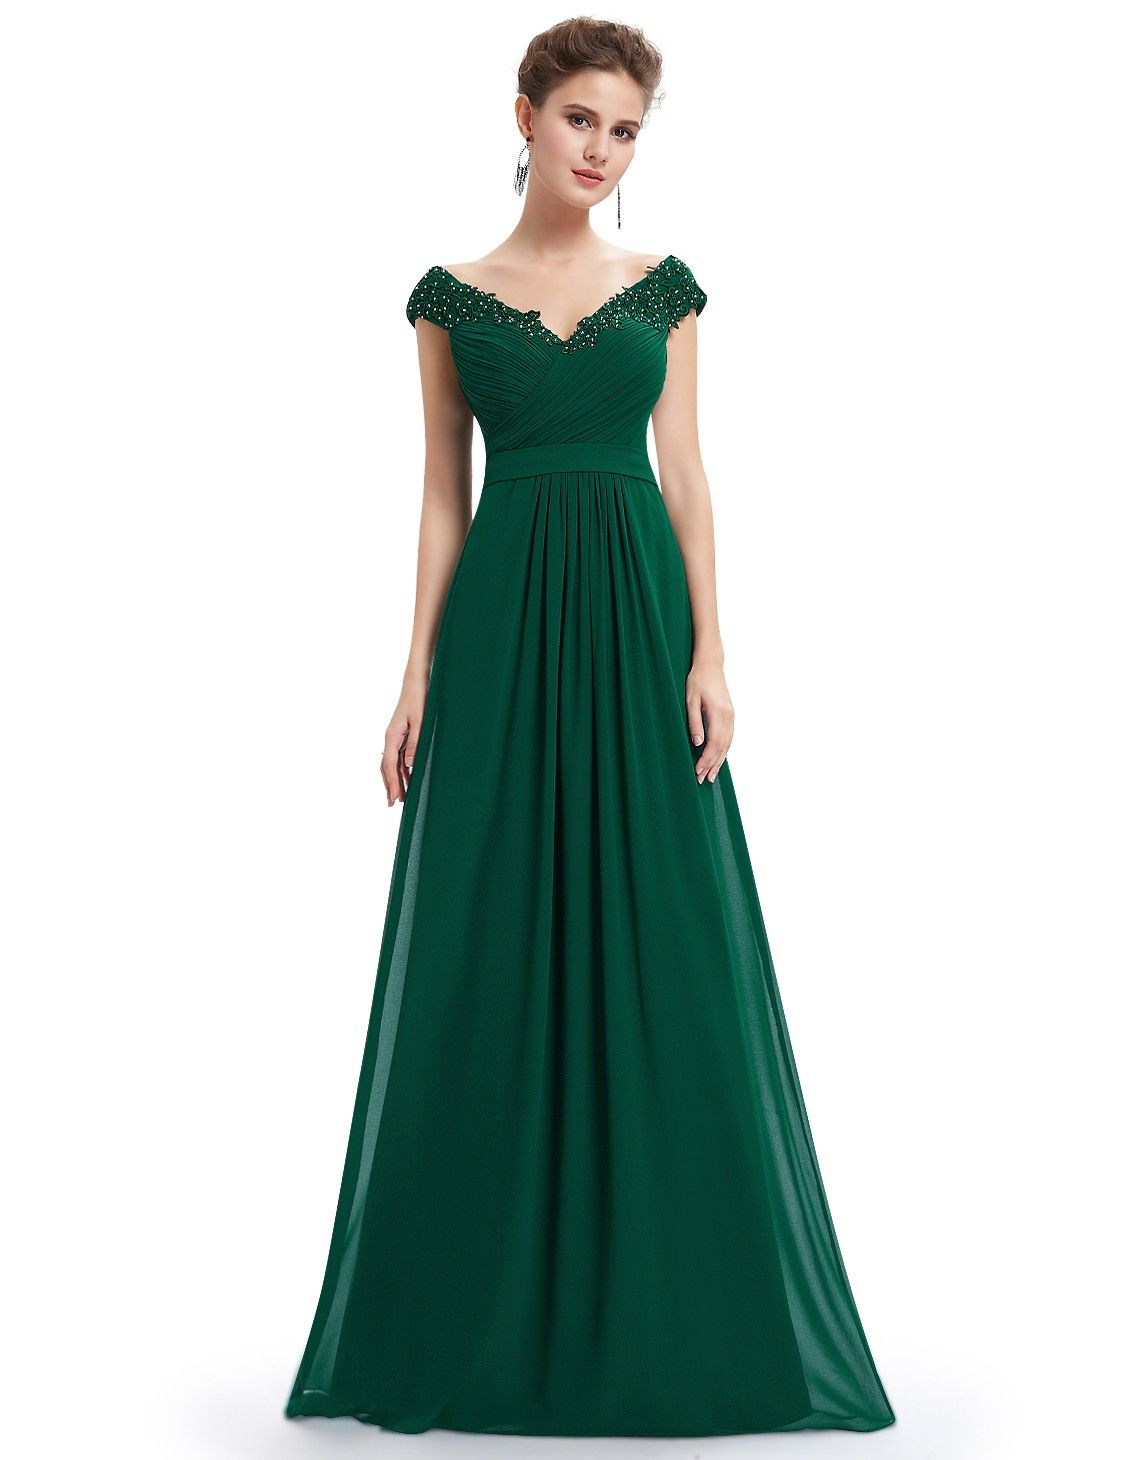 67576a1b02 Elegant Beaded Off Shoulder Evening Gown | Ever-Pretty #eveningdress ...